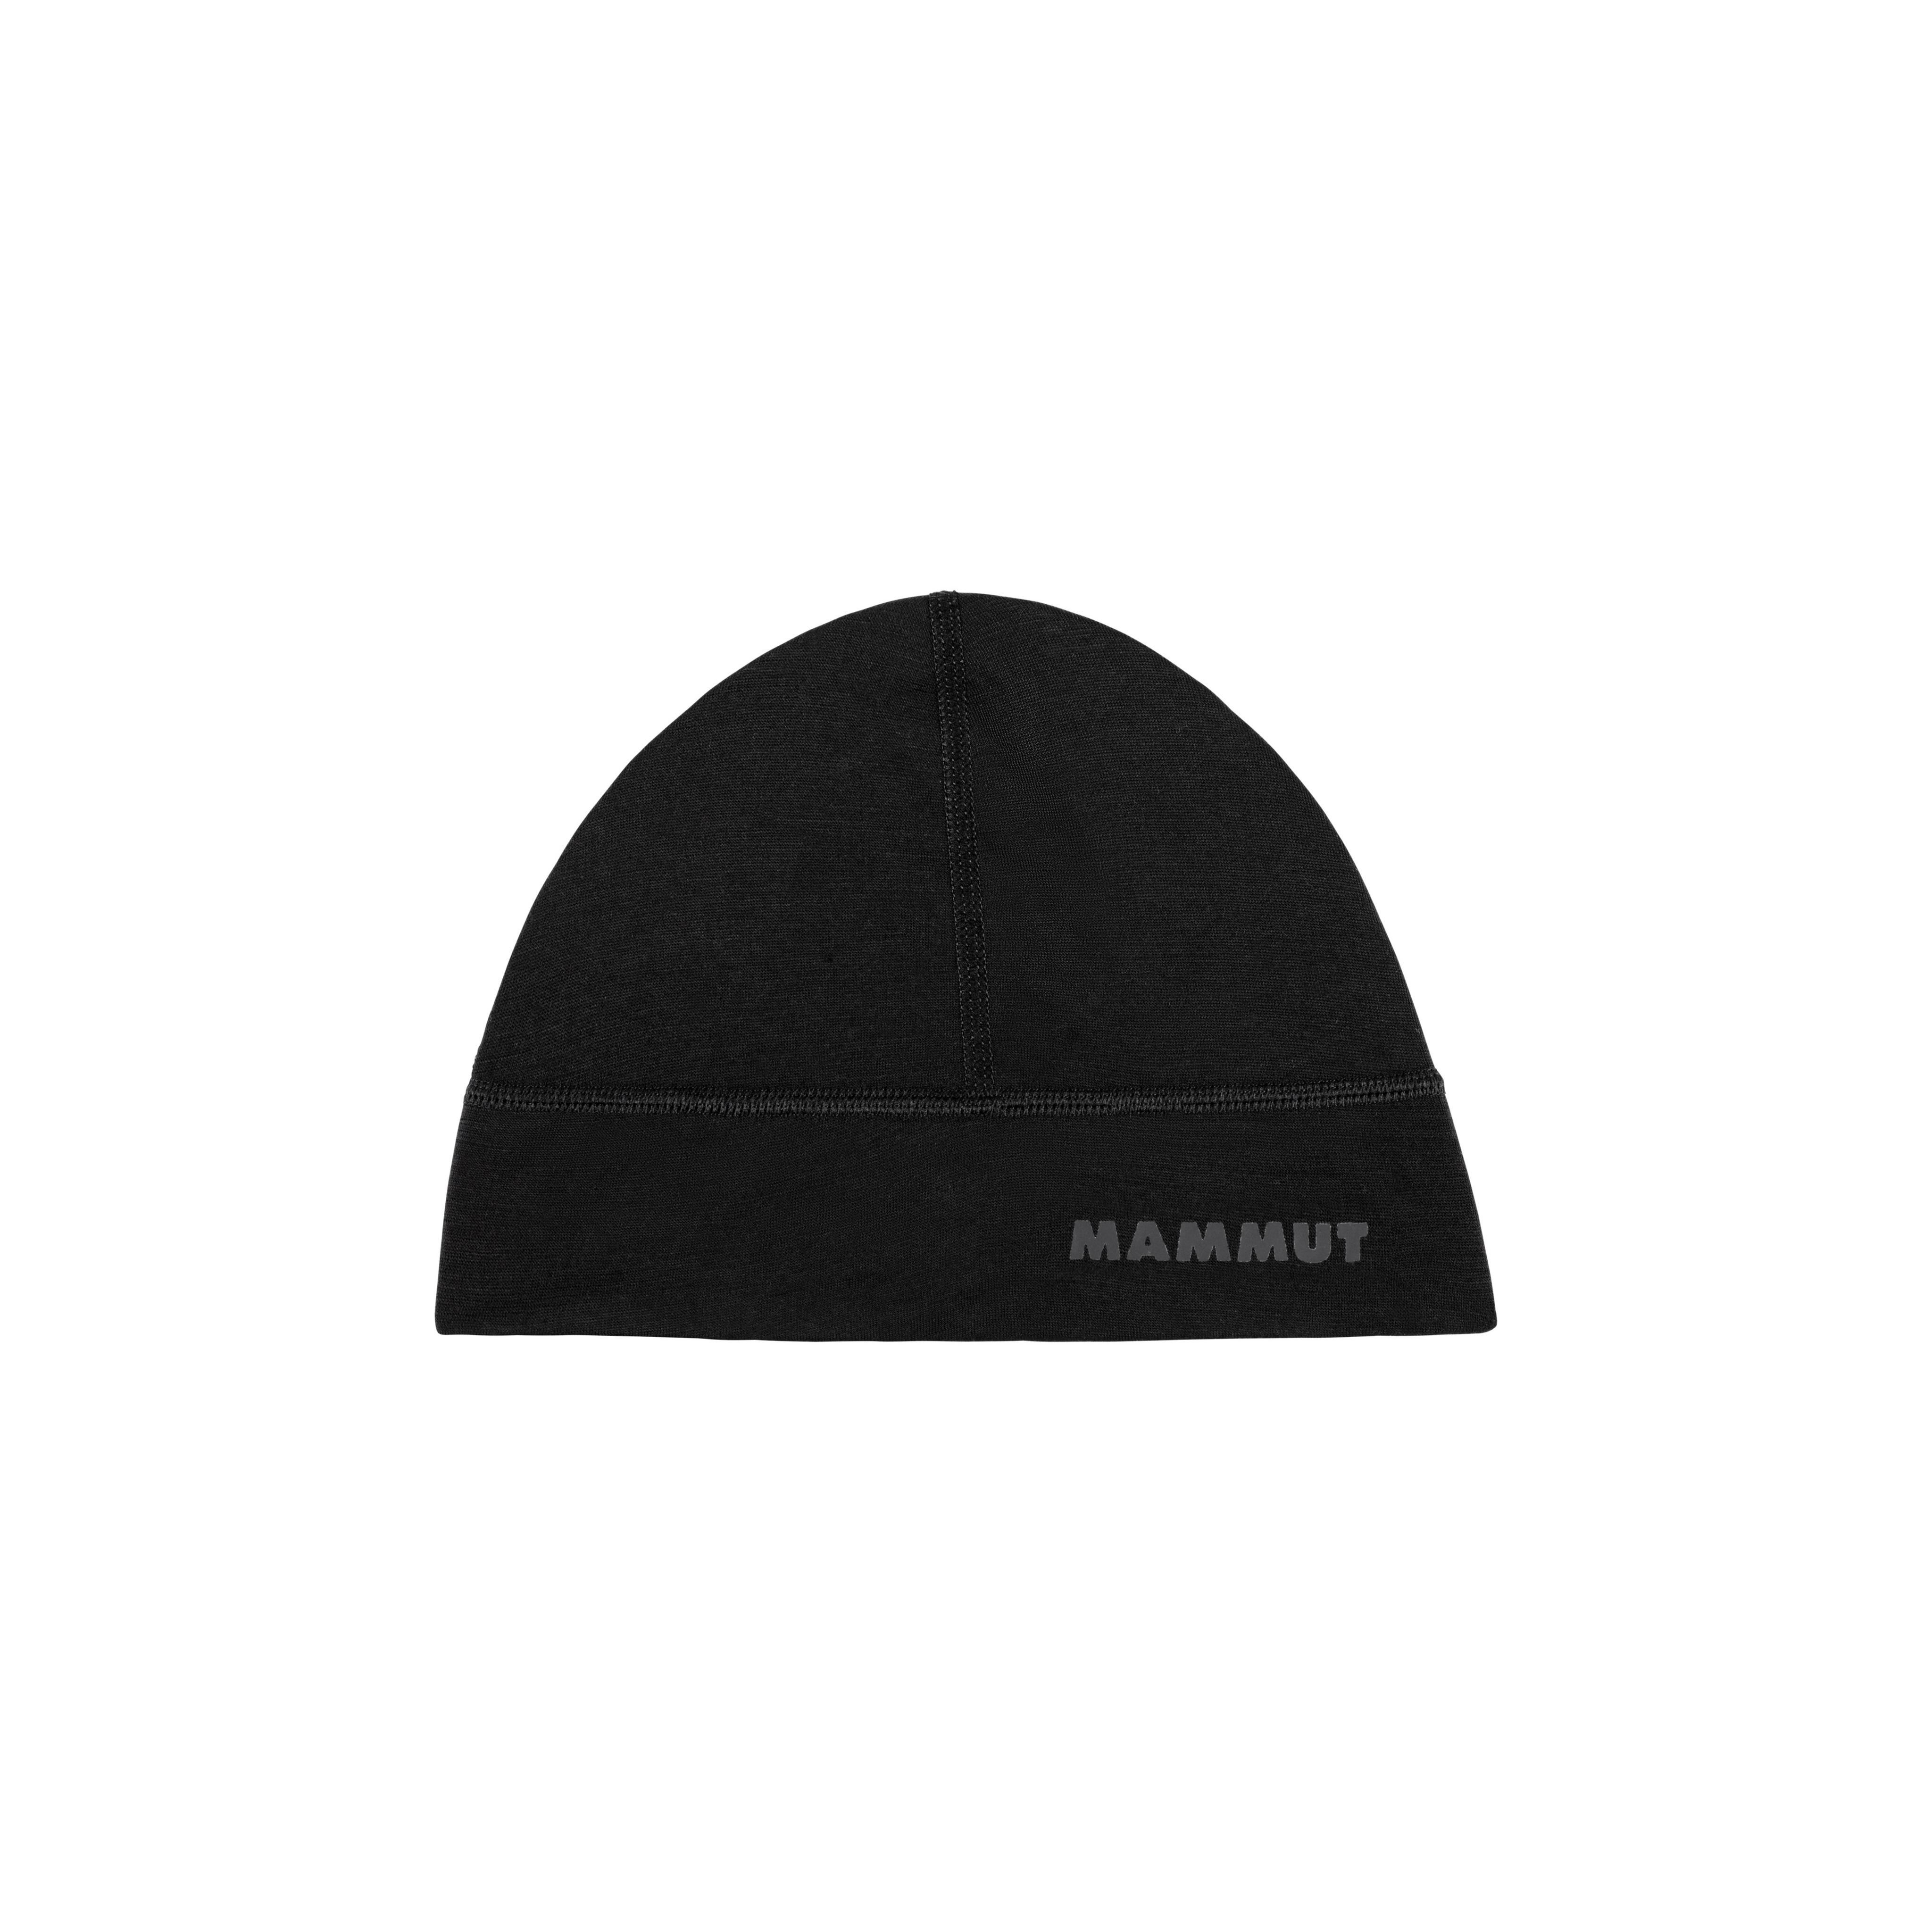 Merino Helmet Beanie - black, one size thumbnail